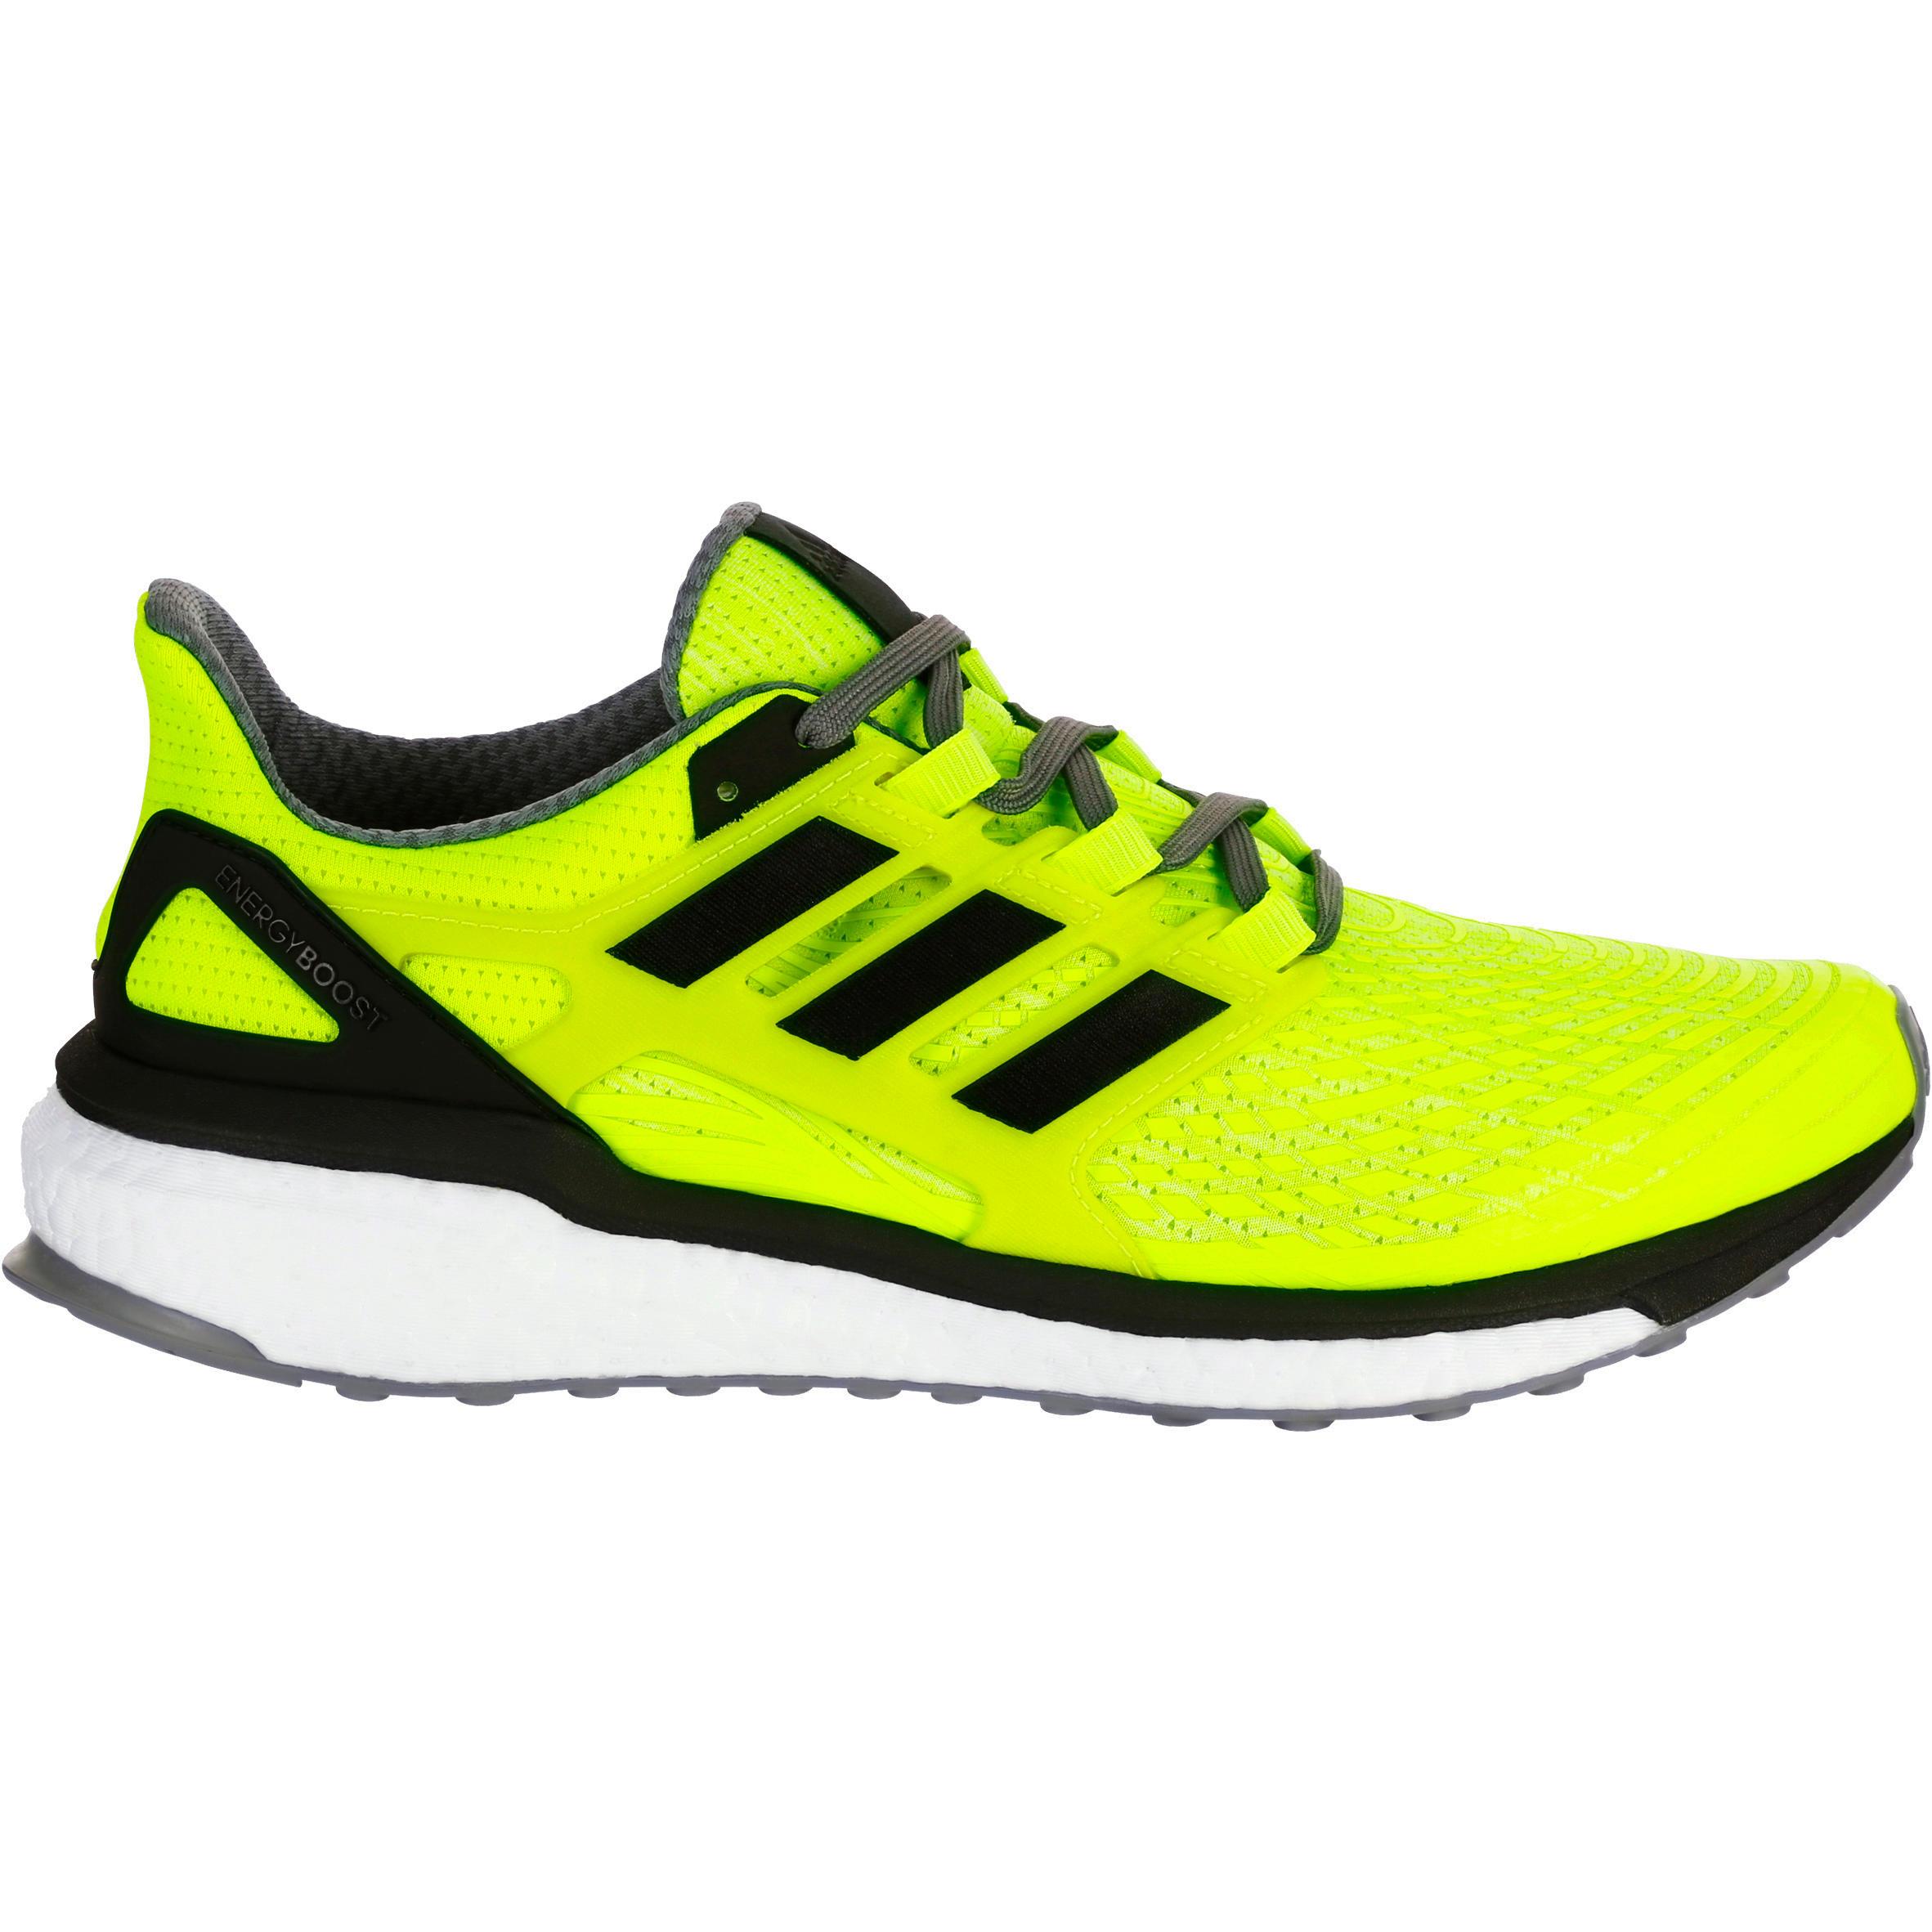 Energy Running 3 Adidas Chaussure Homme Boost Jaune 2HIWE9YD